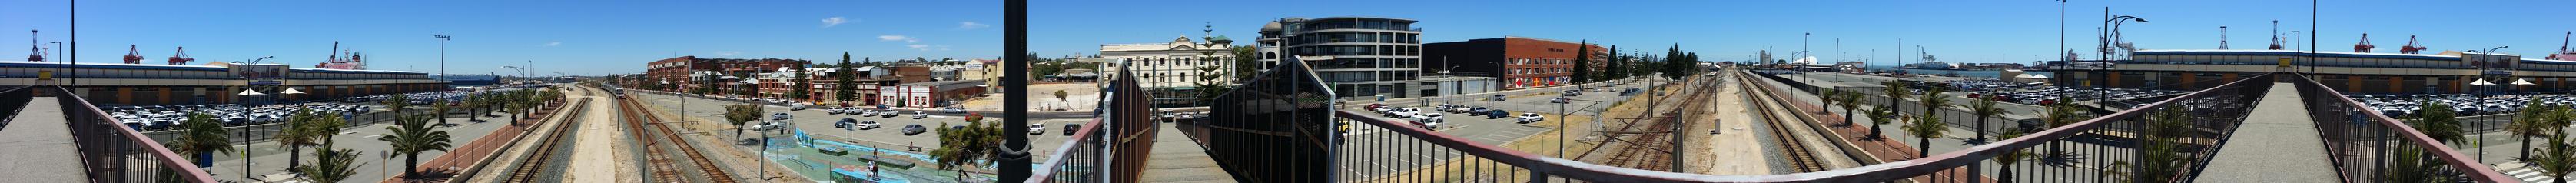 Fremantle 20140104 134113 by macsix